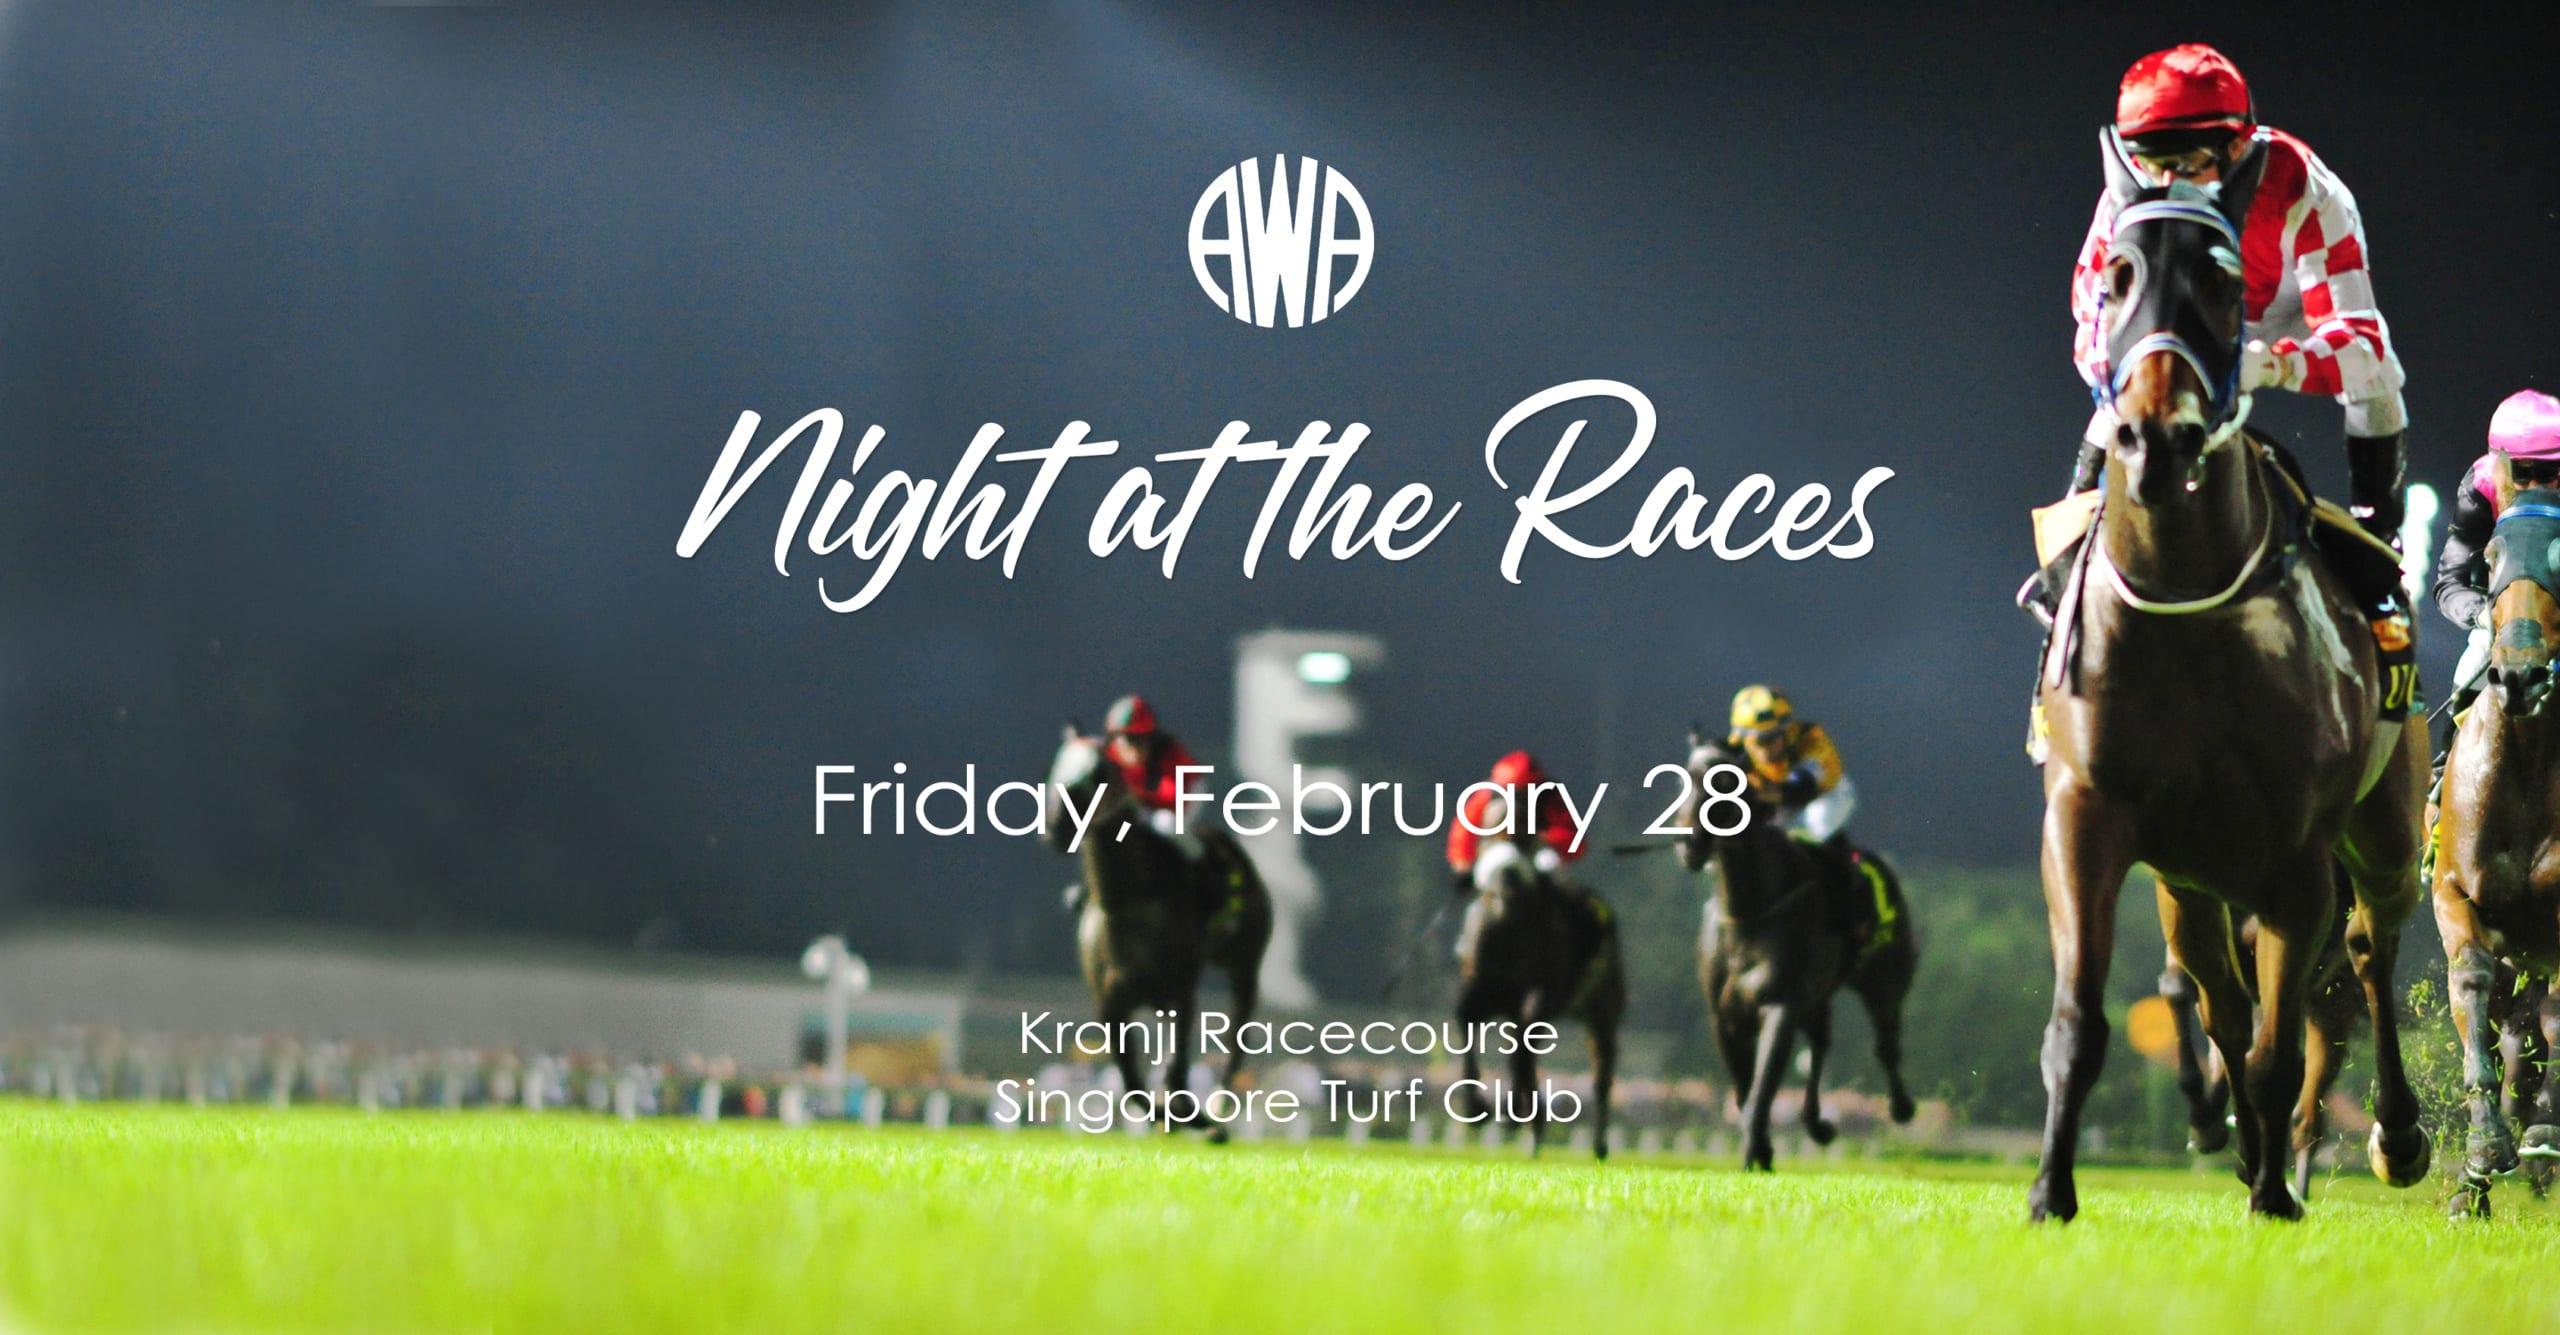 AWA Night At The Races